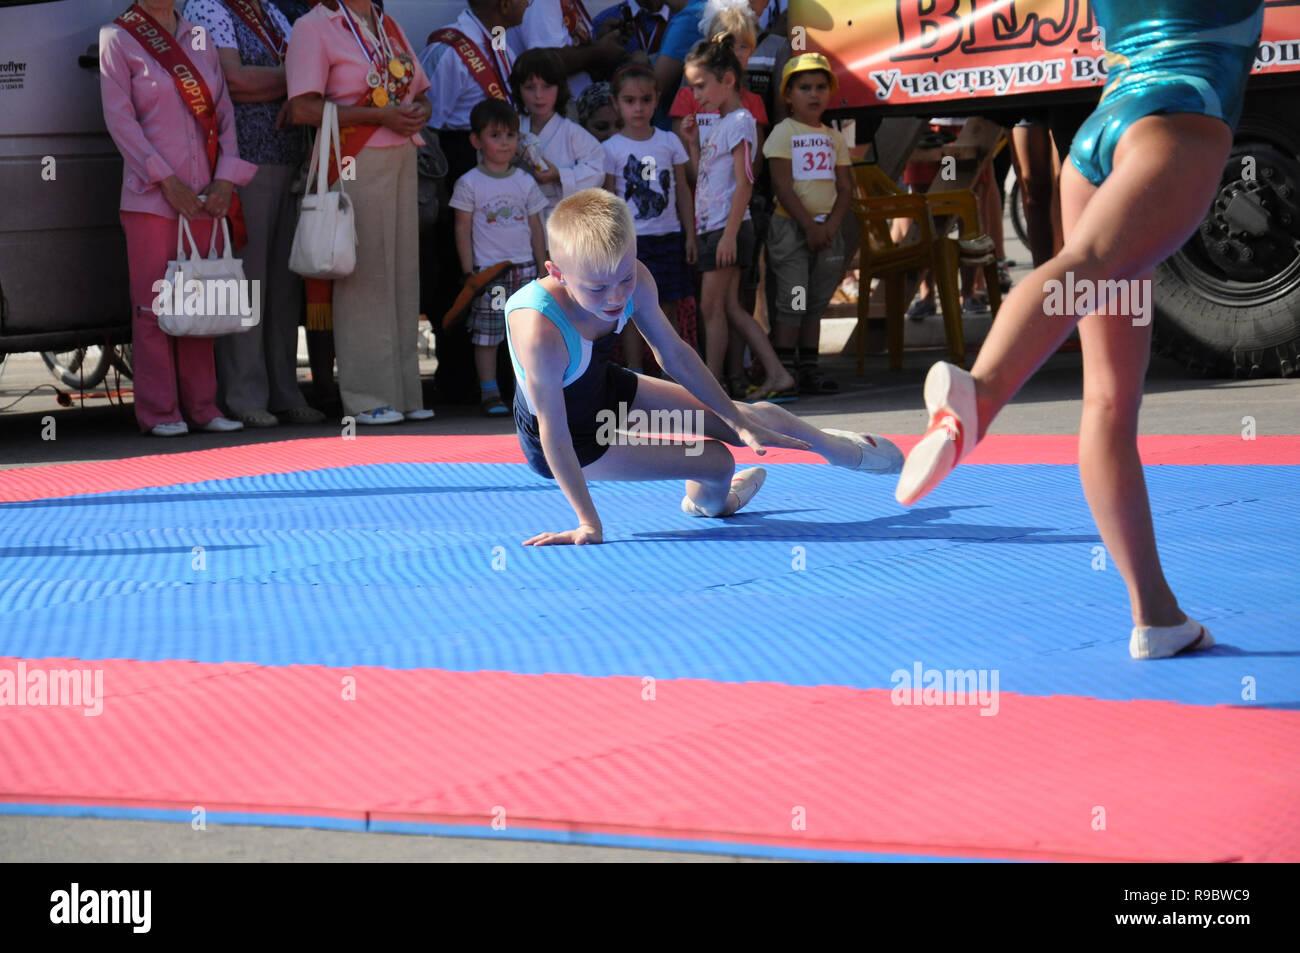 Kovrov Russia 9 August 2014 Sports Holiday Velobum Devoted